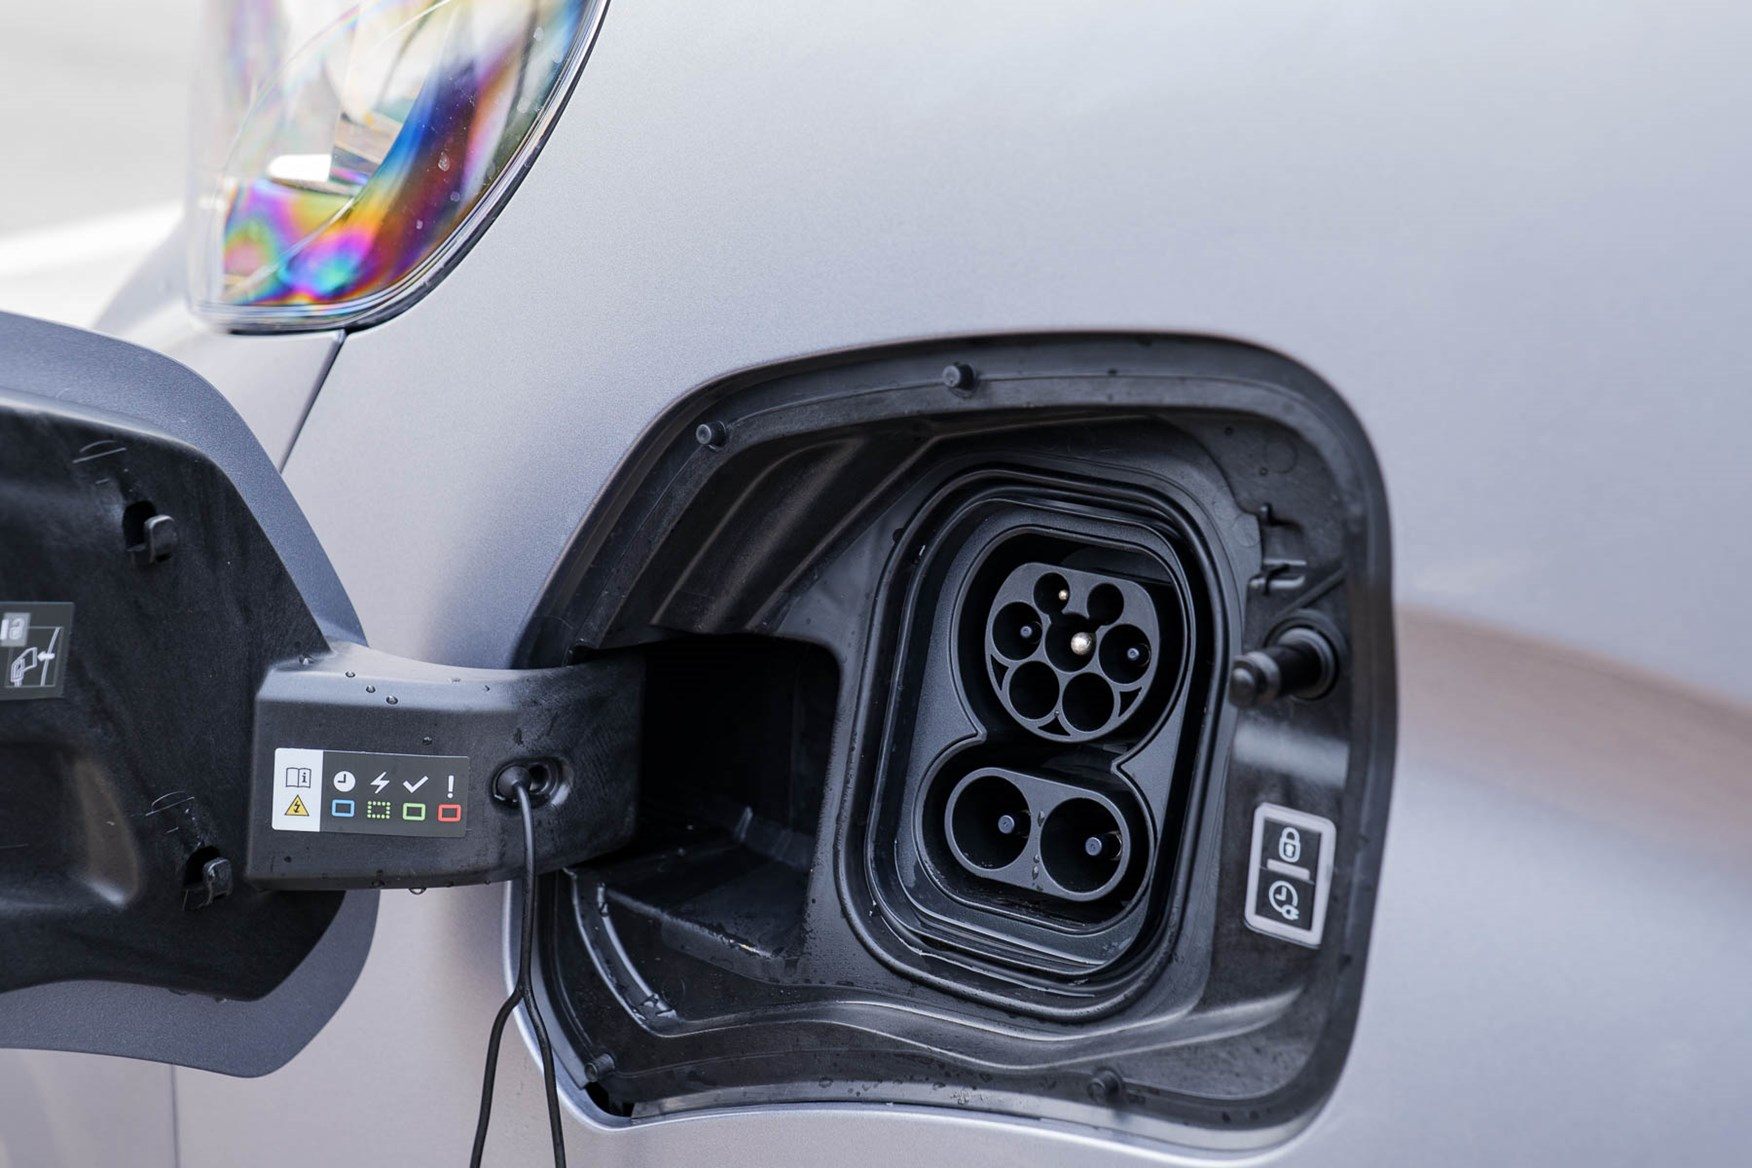 2021 Peugeot e-Expert charging port